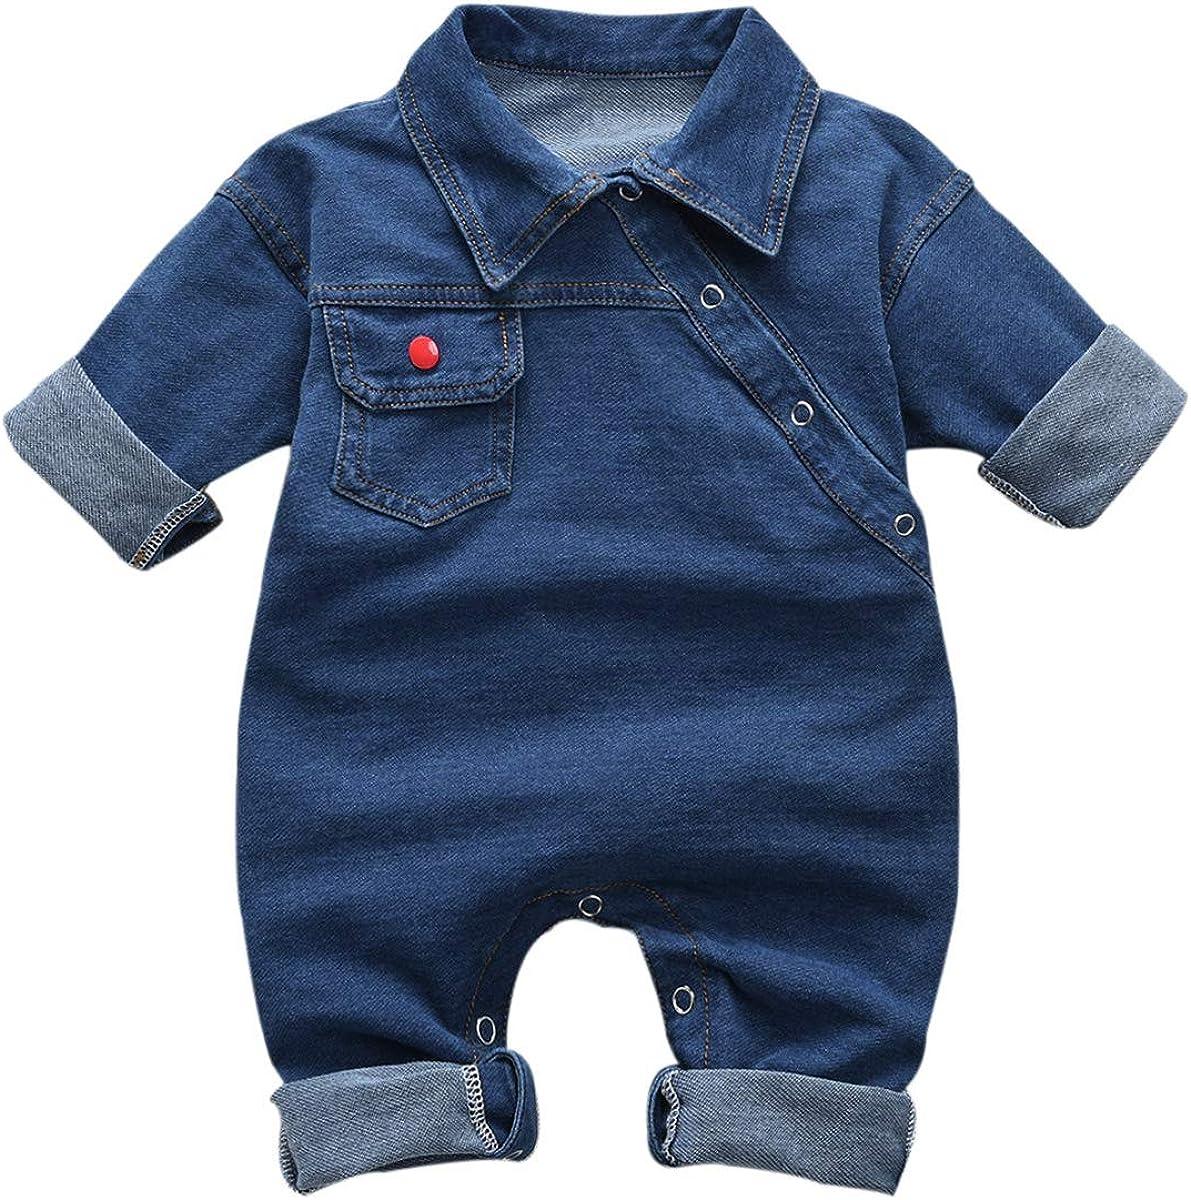 Haokaini Newborn Baby Turn Down Max 88% OFF Collar Cool Jeans Bo Romper Boys Overseas parallel import regular item